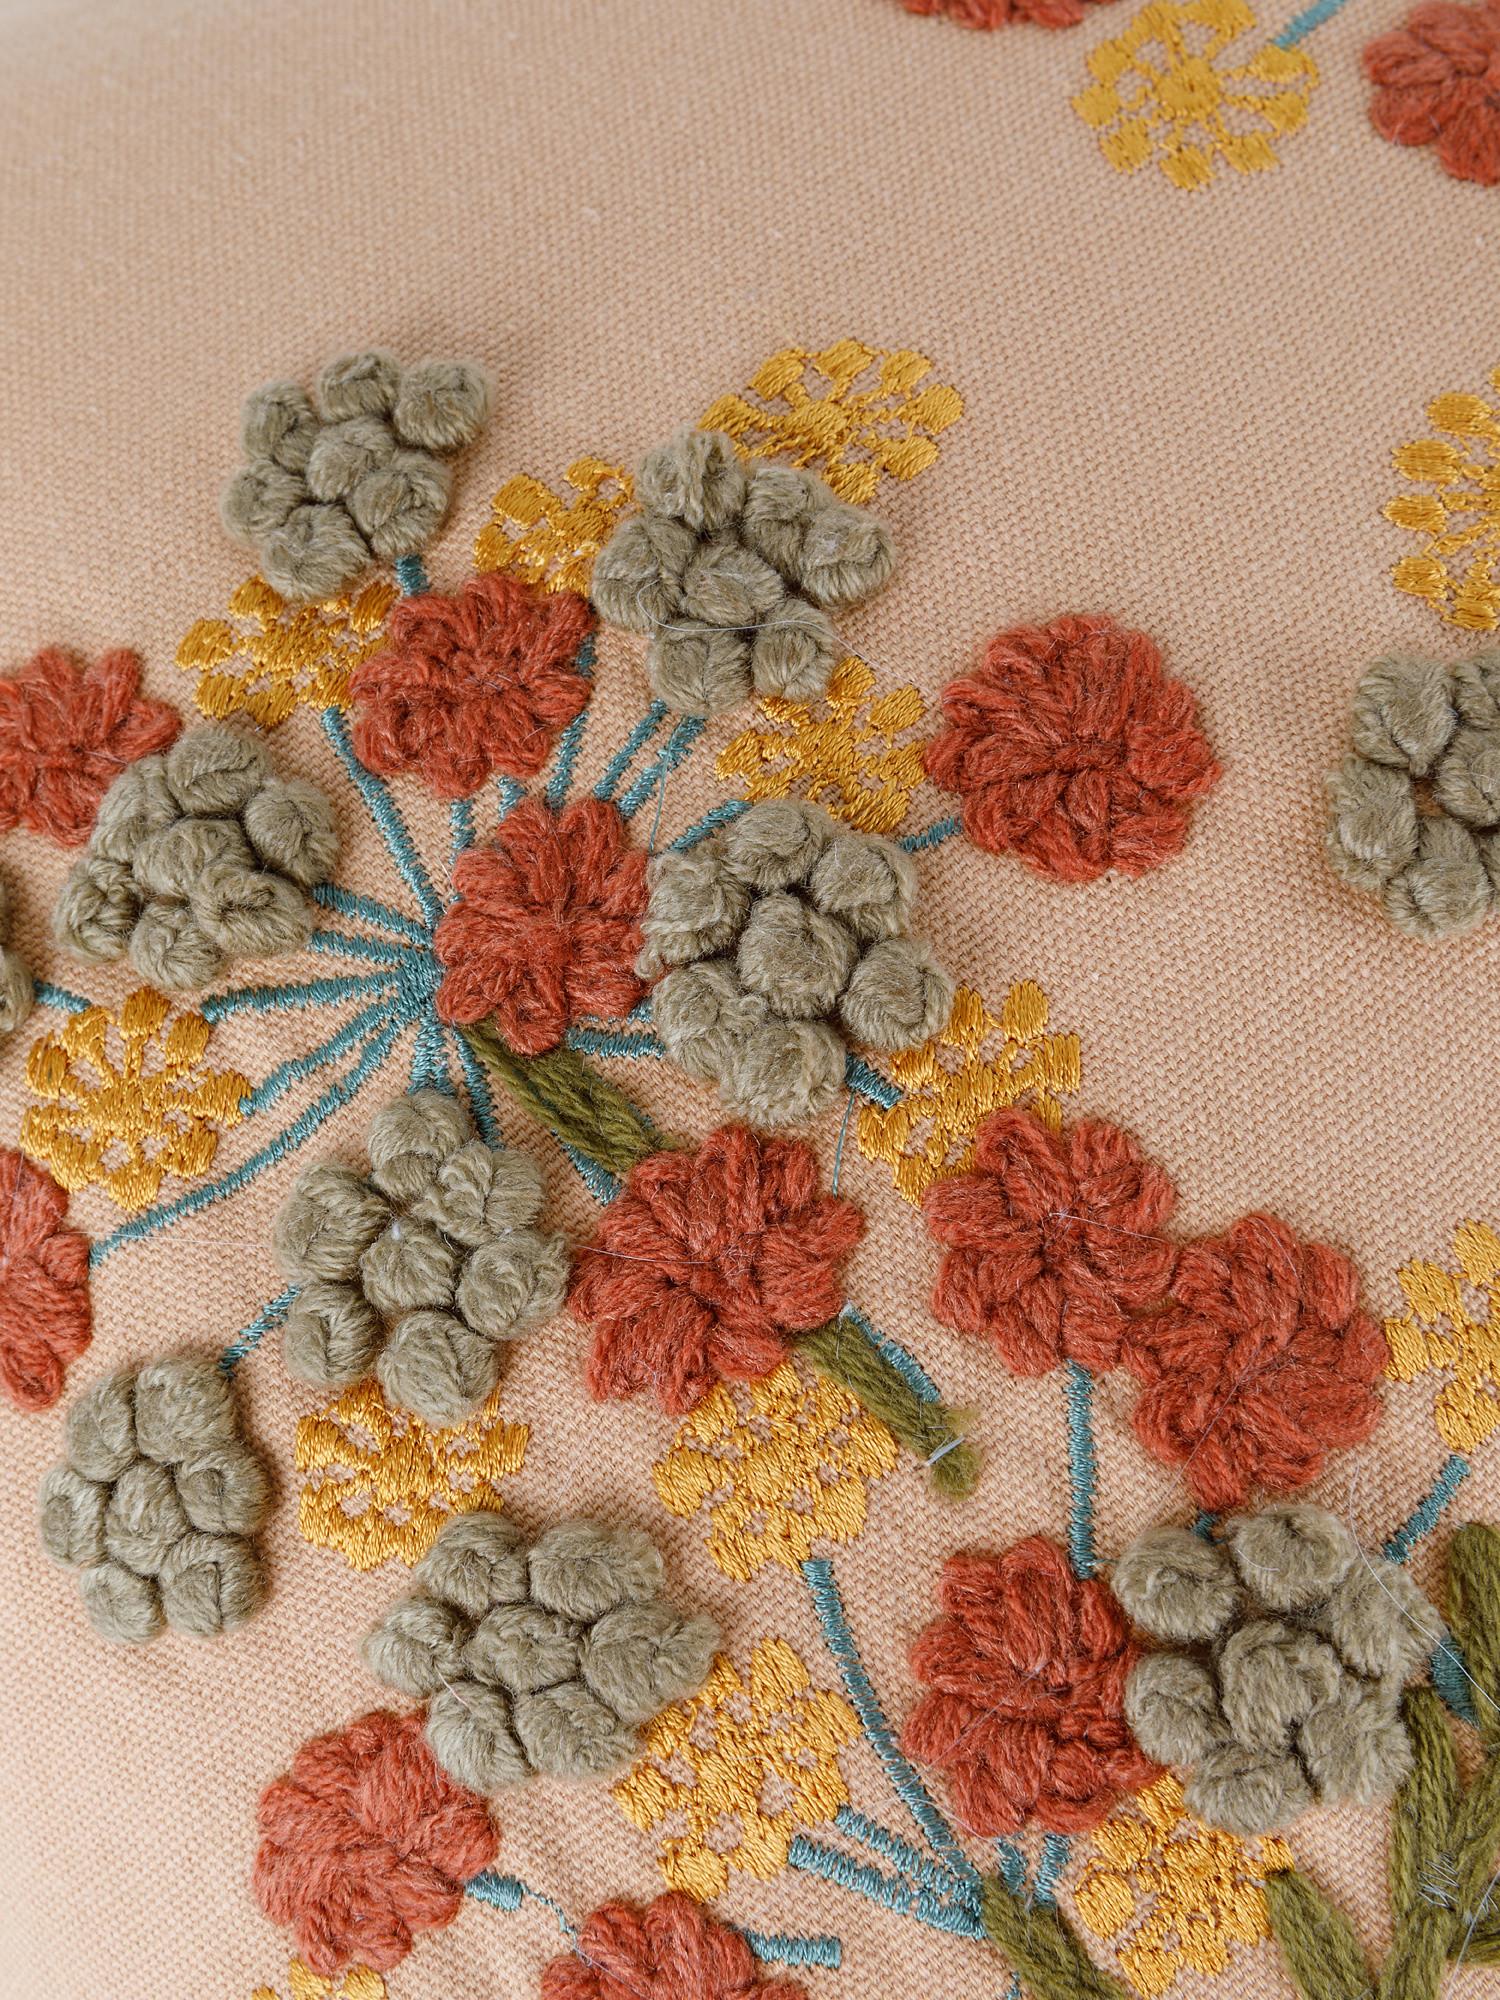 Cuscino cotone ricamo floreale 35x50cm, Multicolor, large image number 2